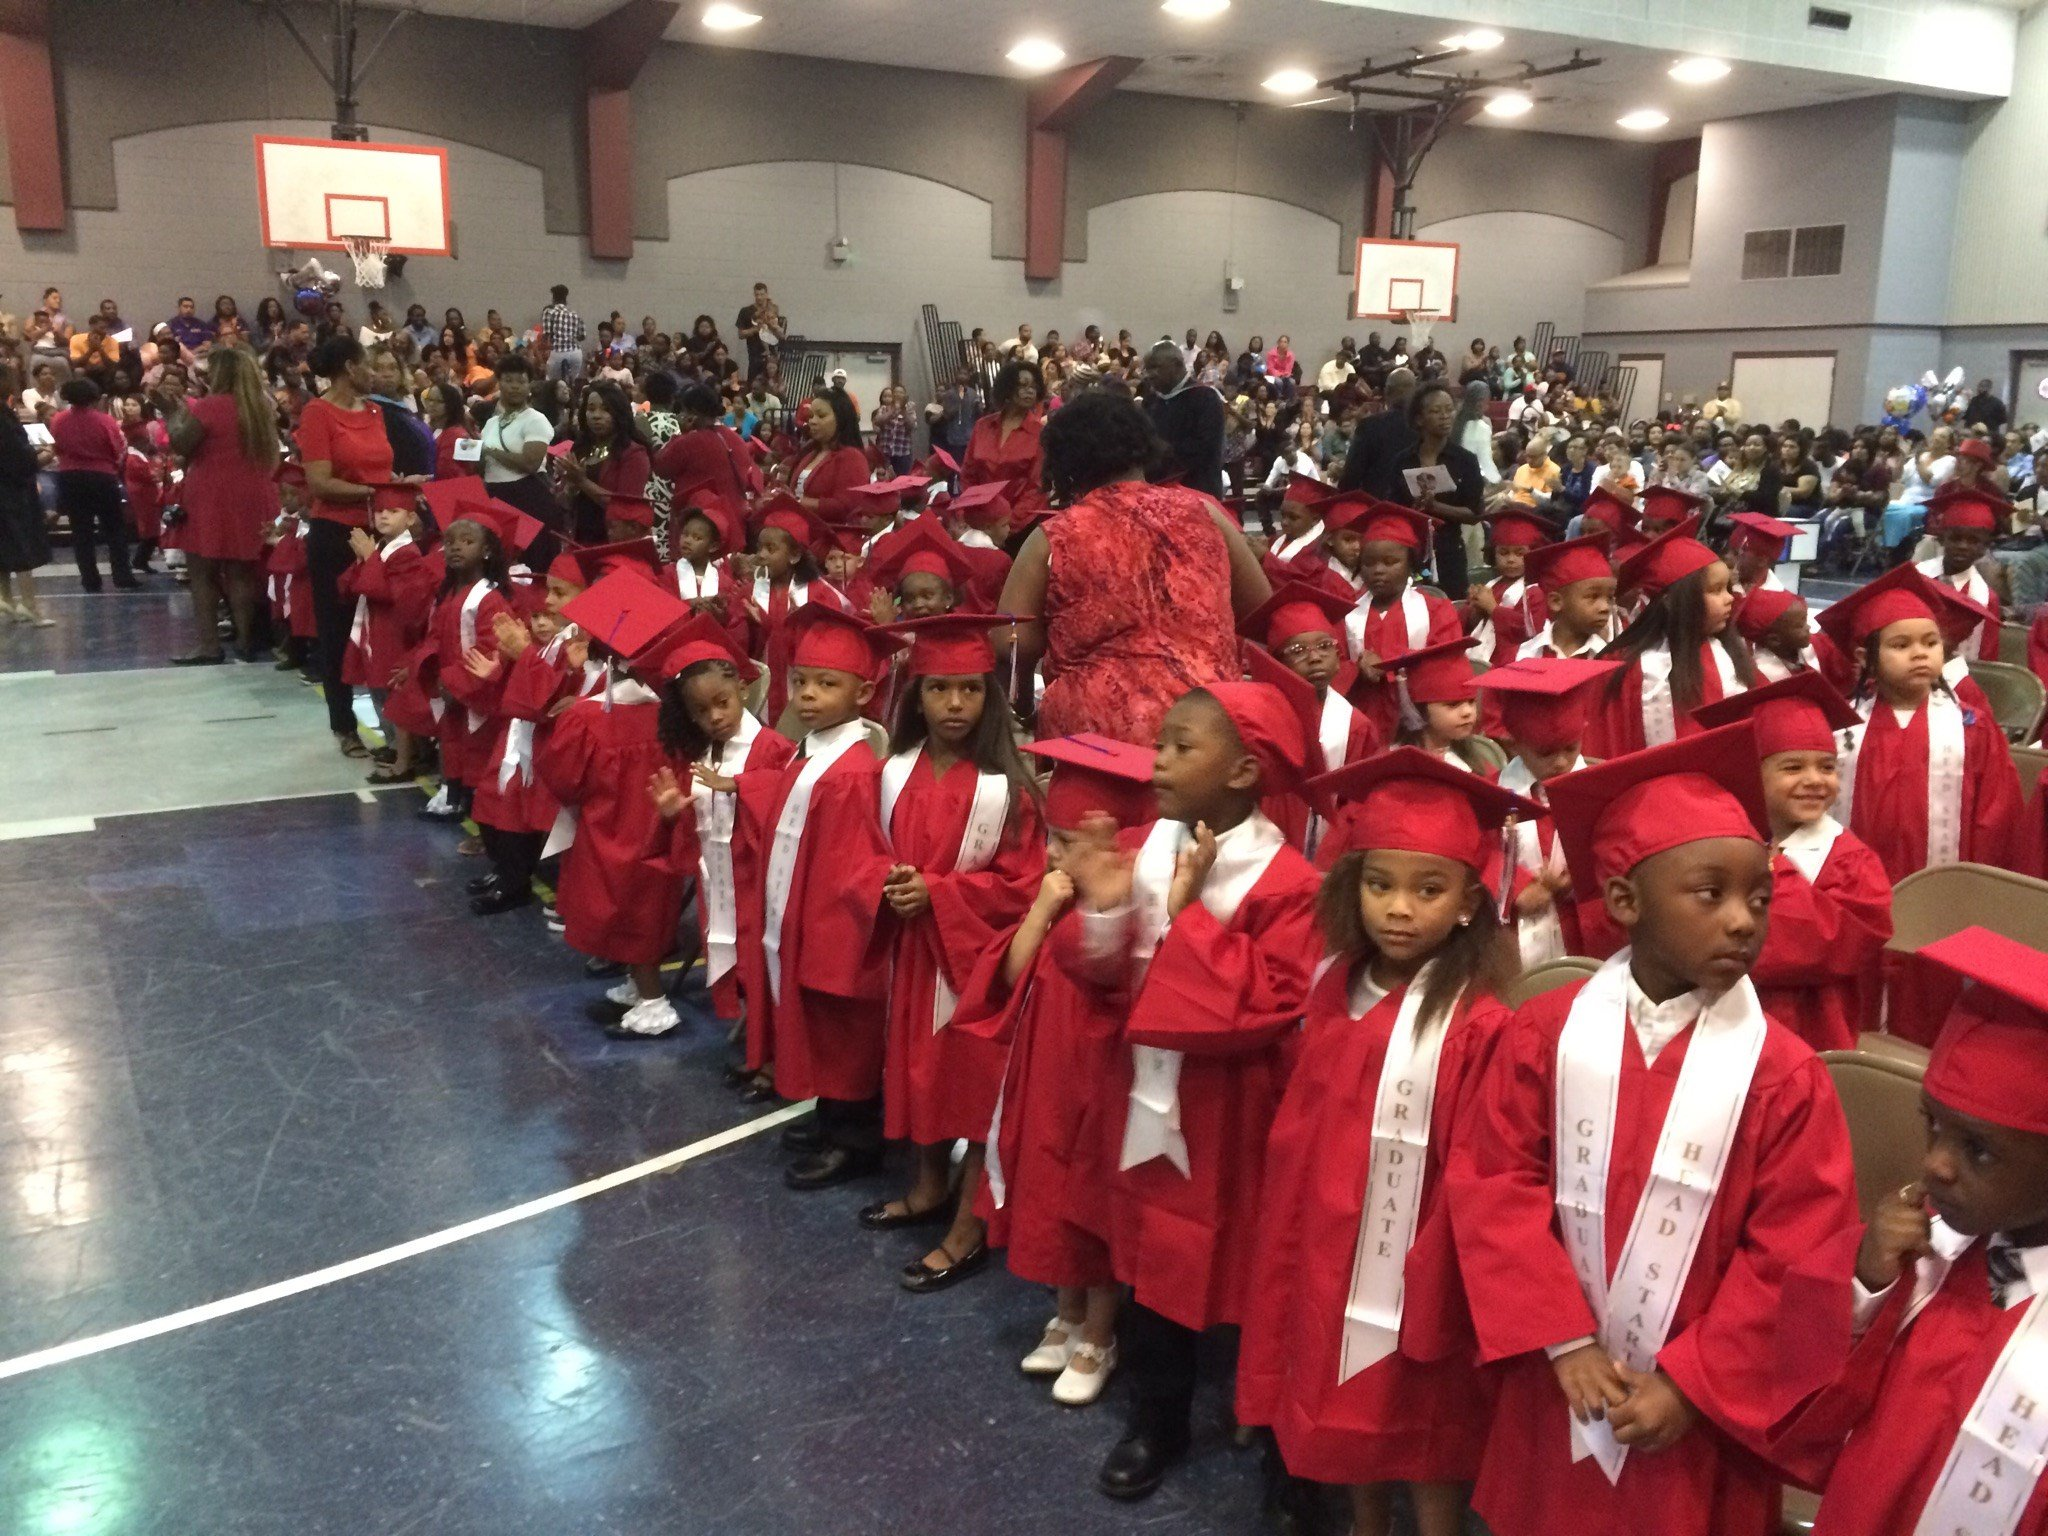 Students at Headstart in Lafayette graduate today / KATC